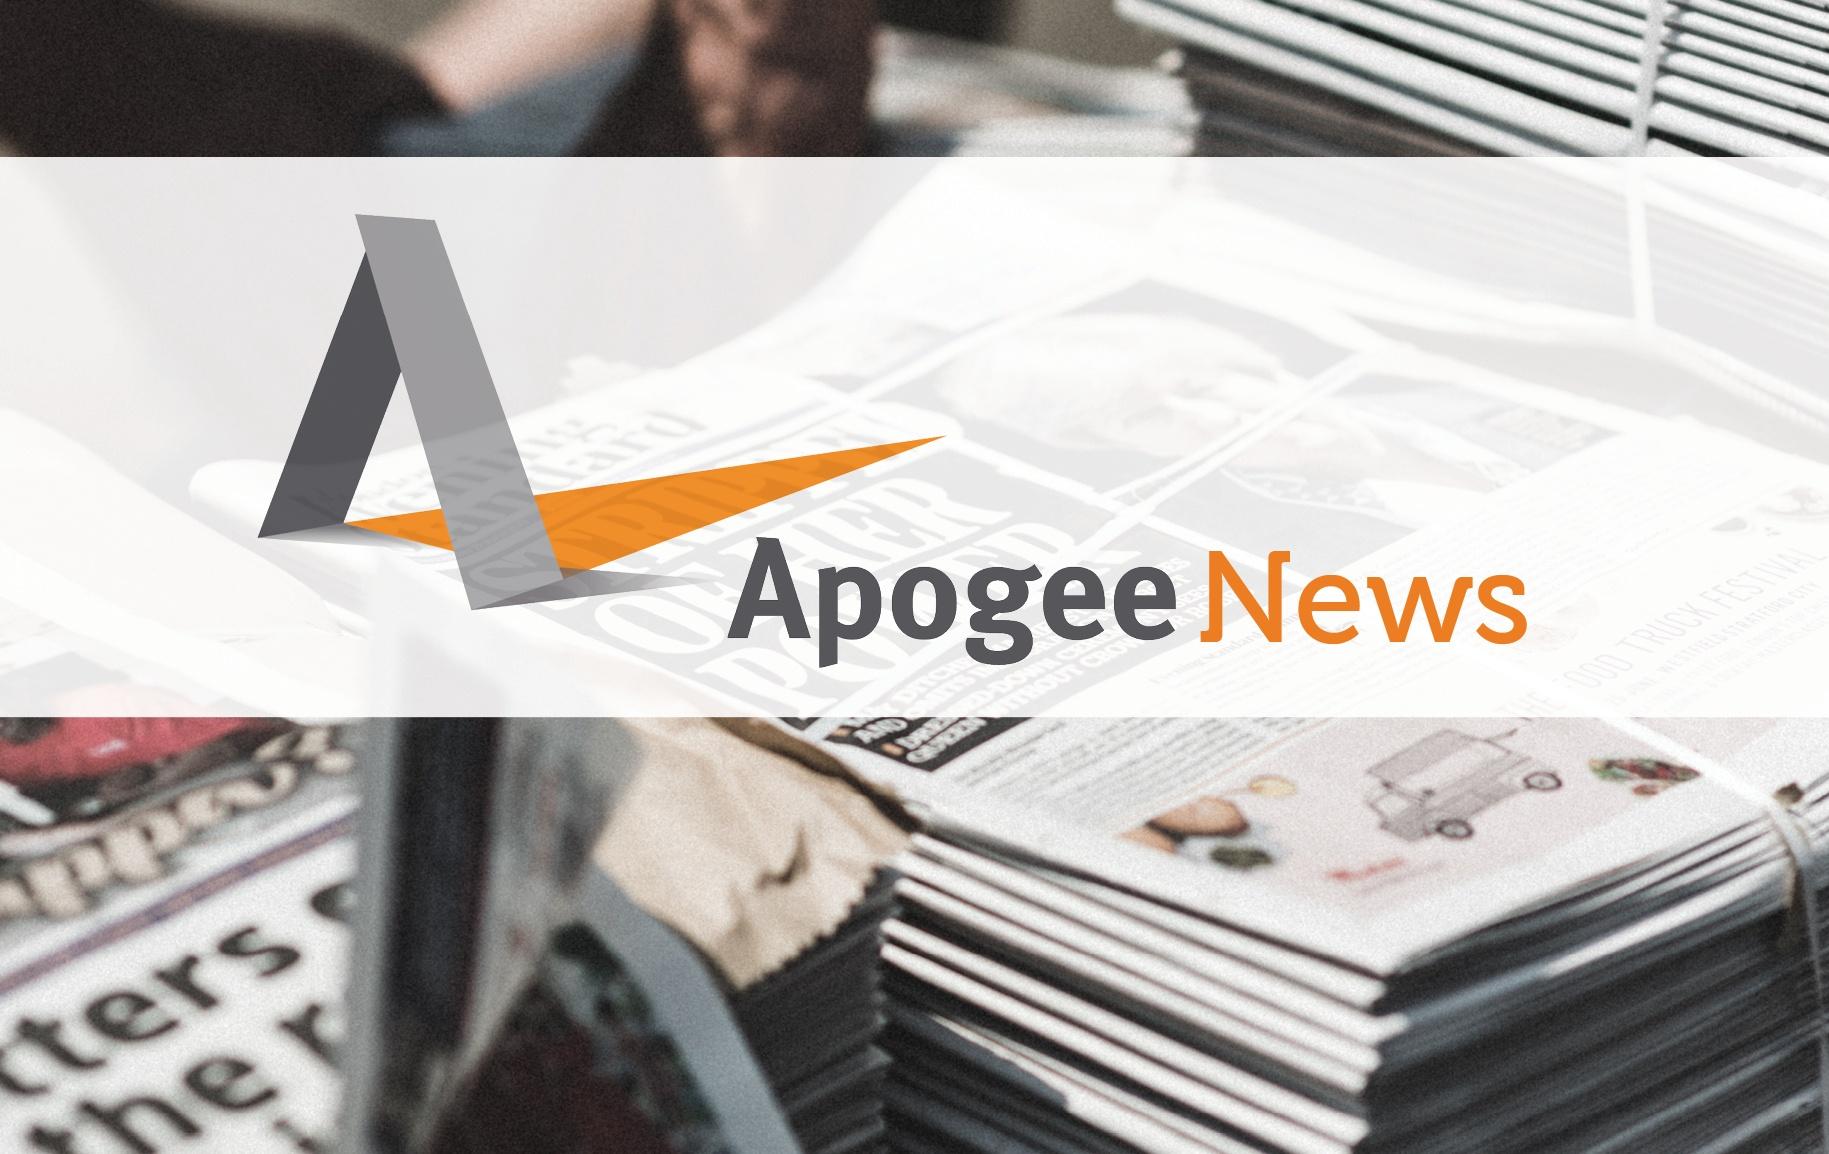 Apogee News.jpg